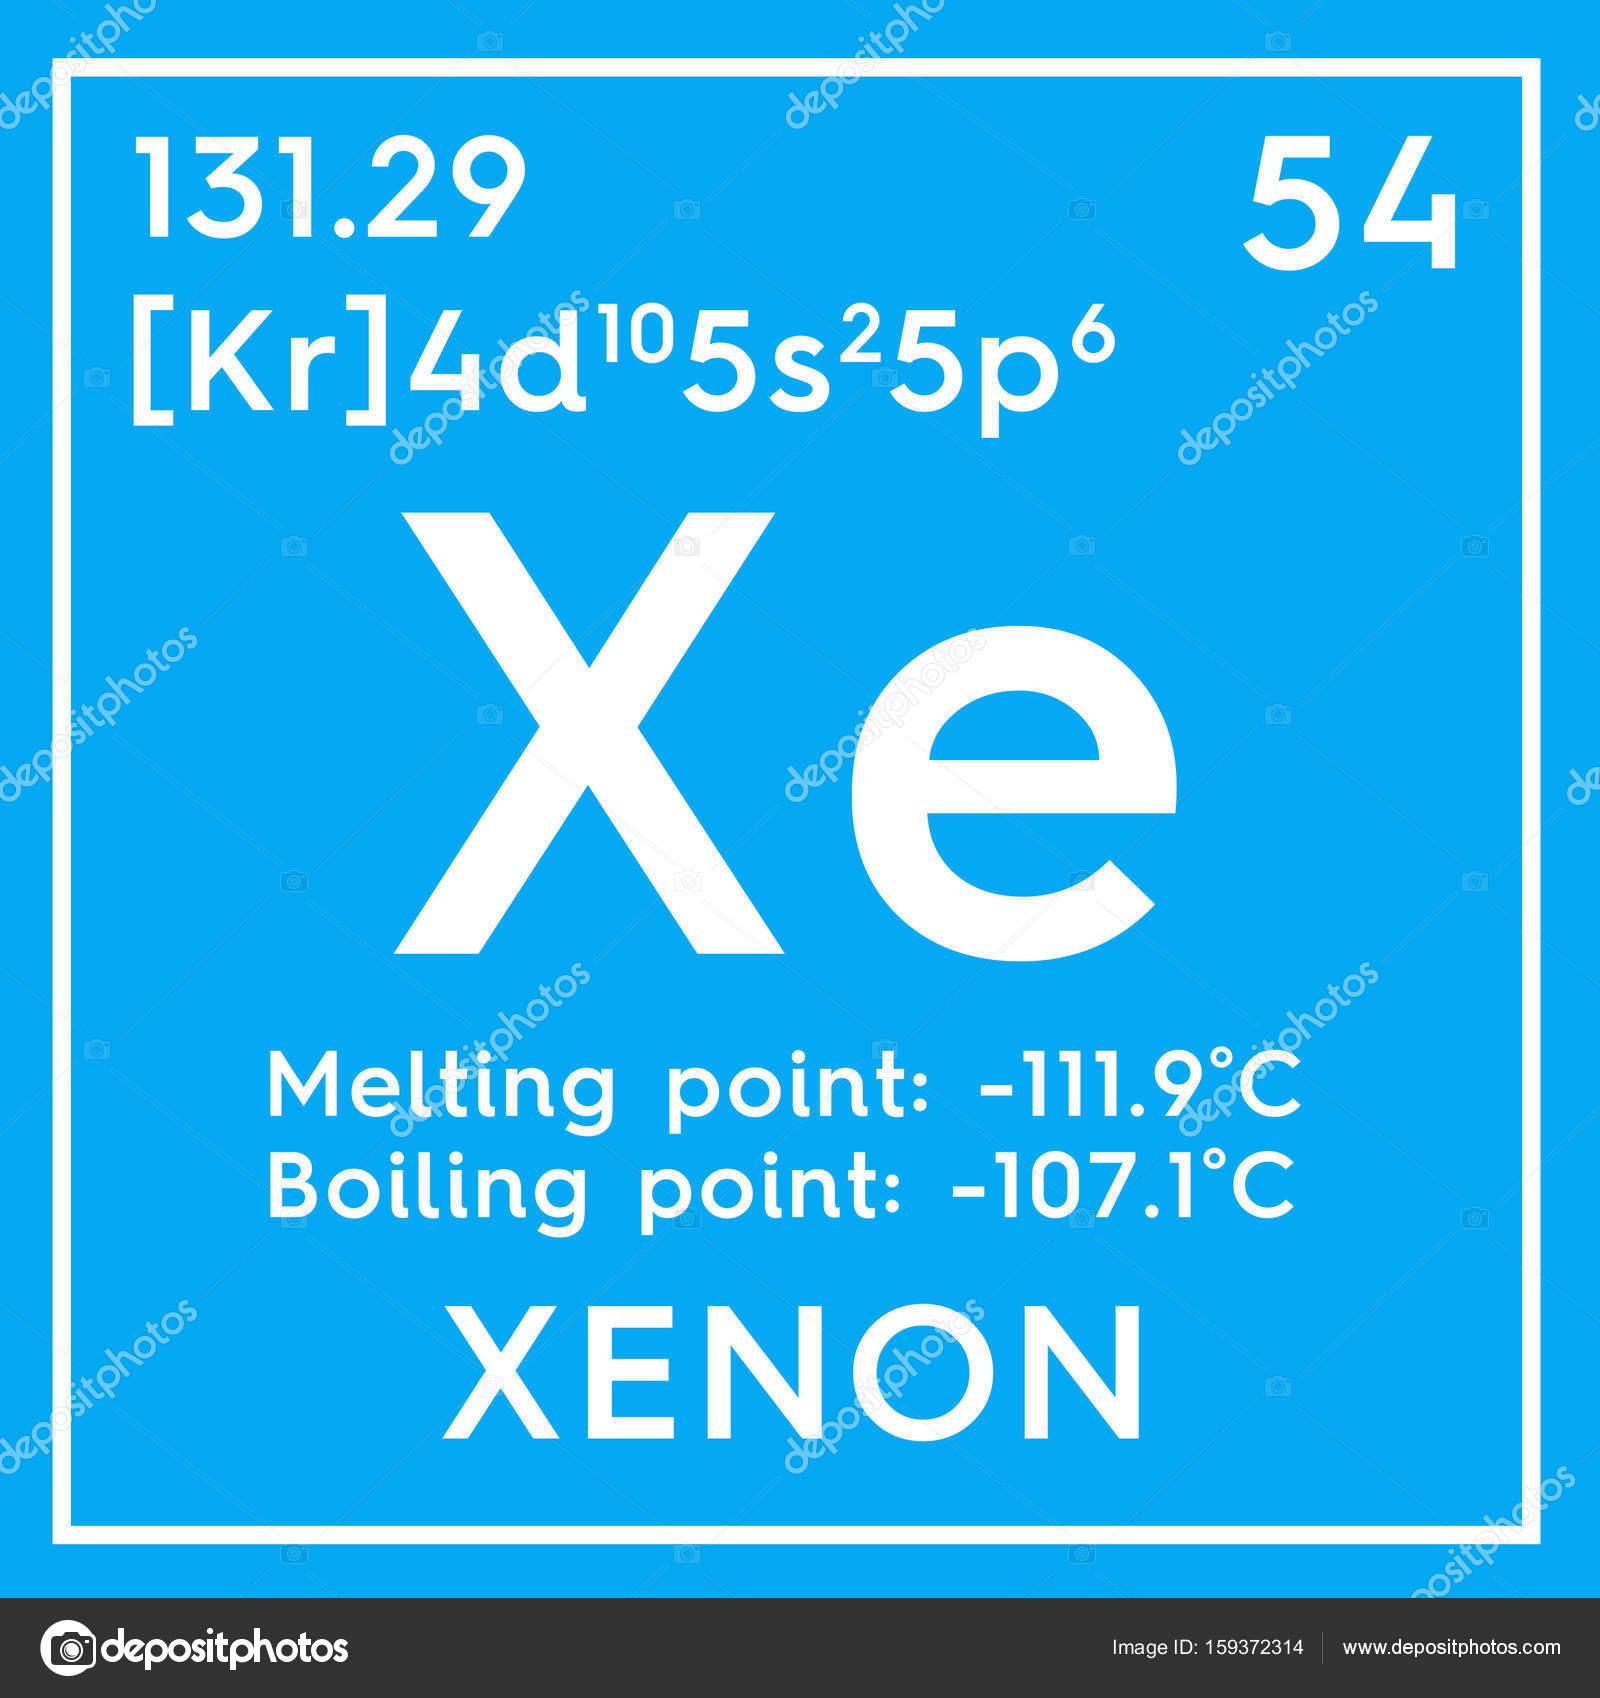 Xenn gases nobles elemento qumico de la tabla de periodica de xenn gases nobles elemento qumico de la tabla de periodica de mendeleiev fotos urtaz Gallery